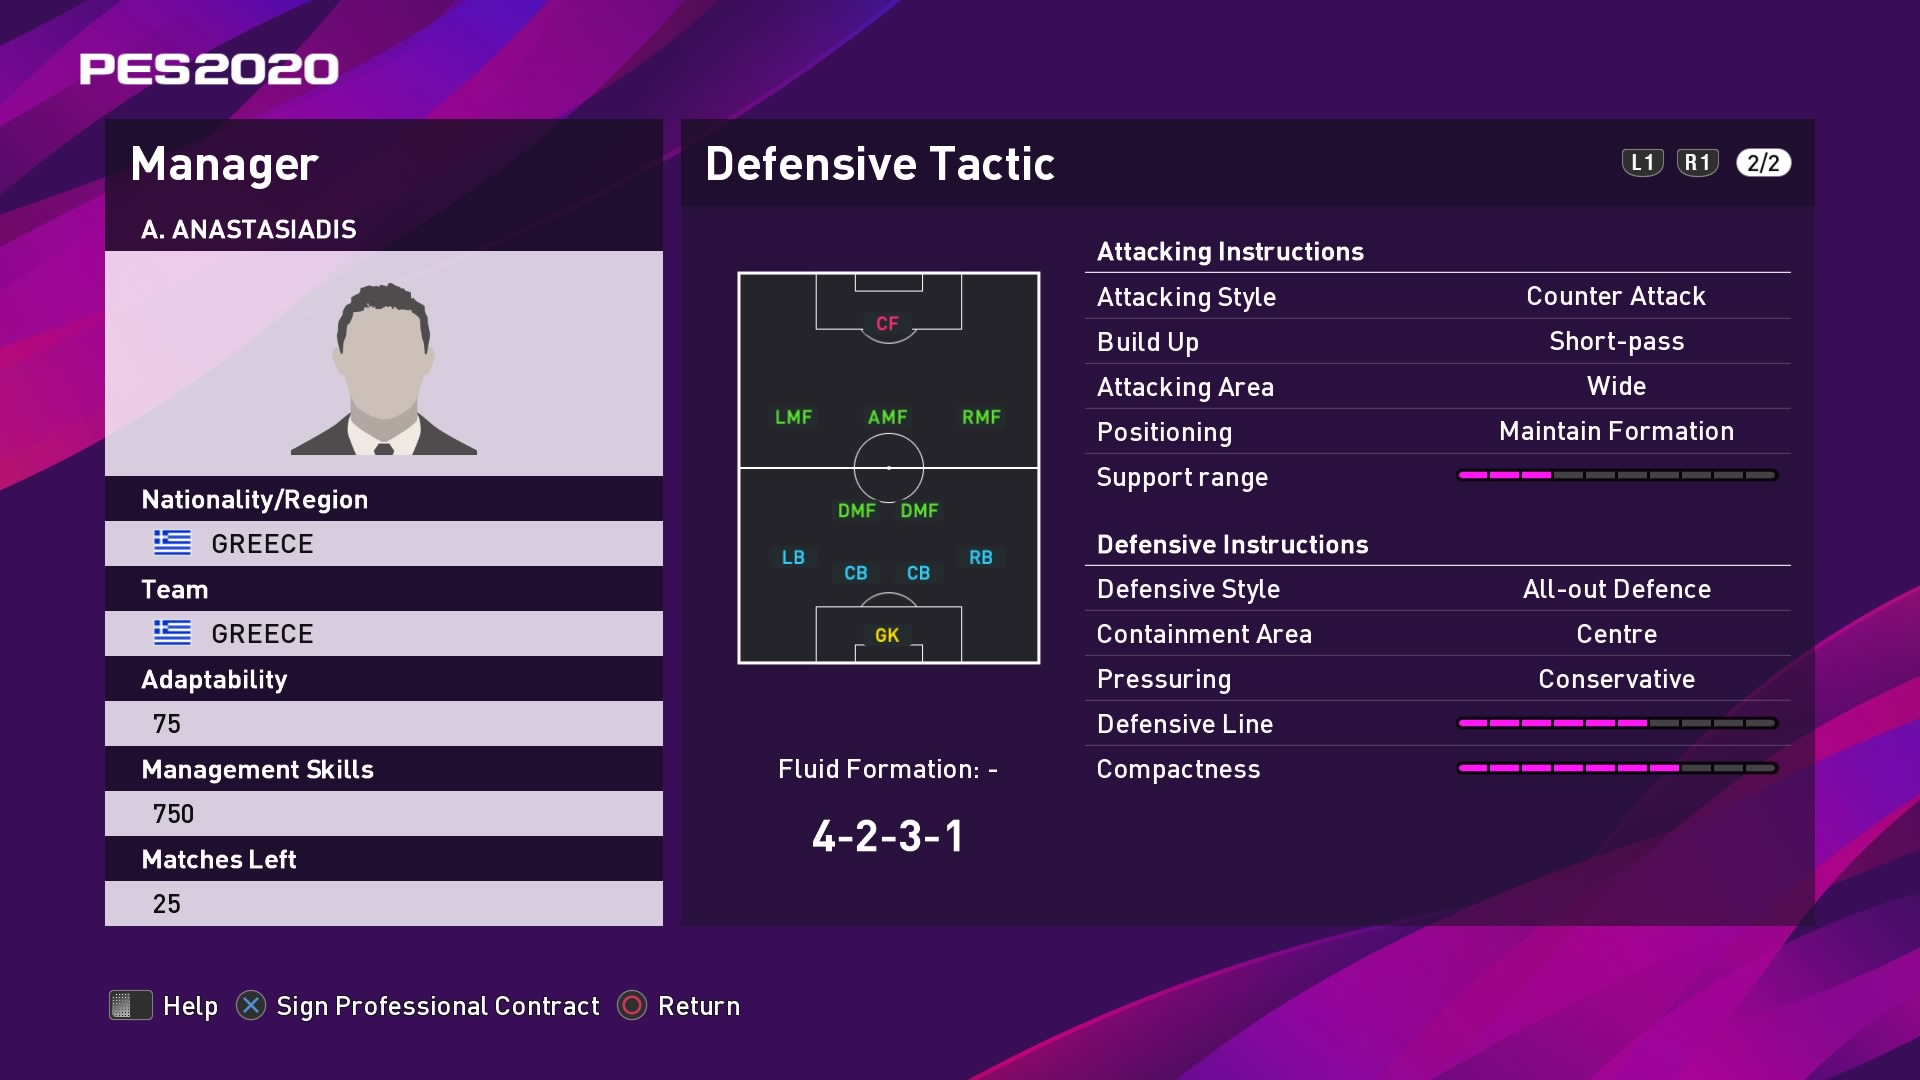 A. Anastasiadis (Angelos Anastasiadis) Defensive Tactic in PES 2020 myClub